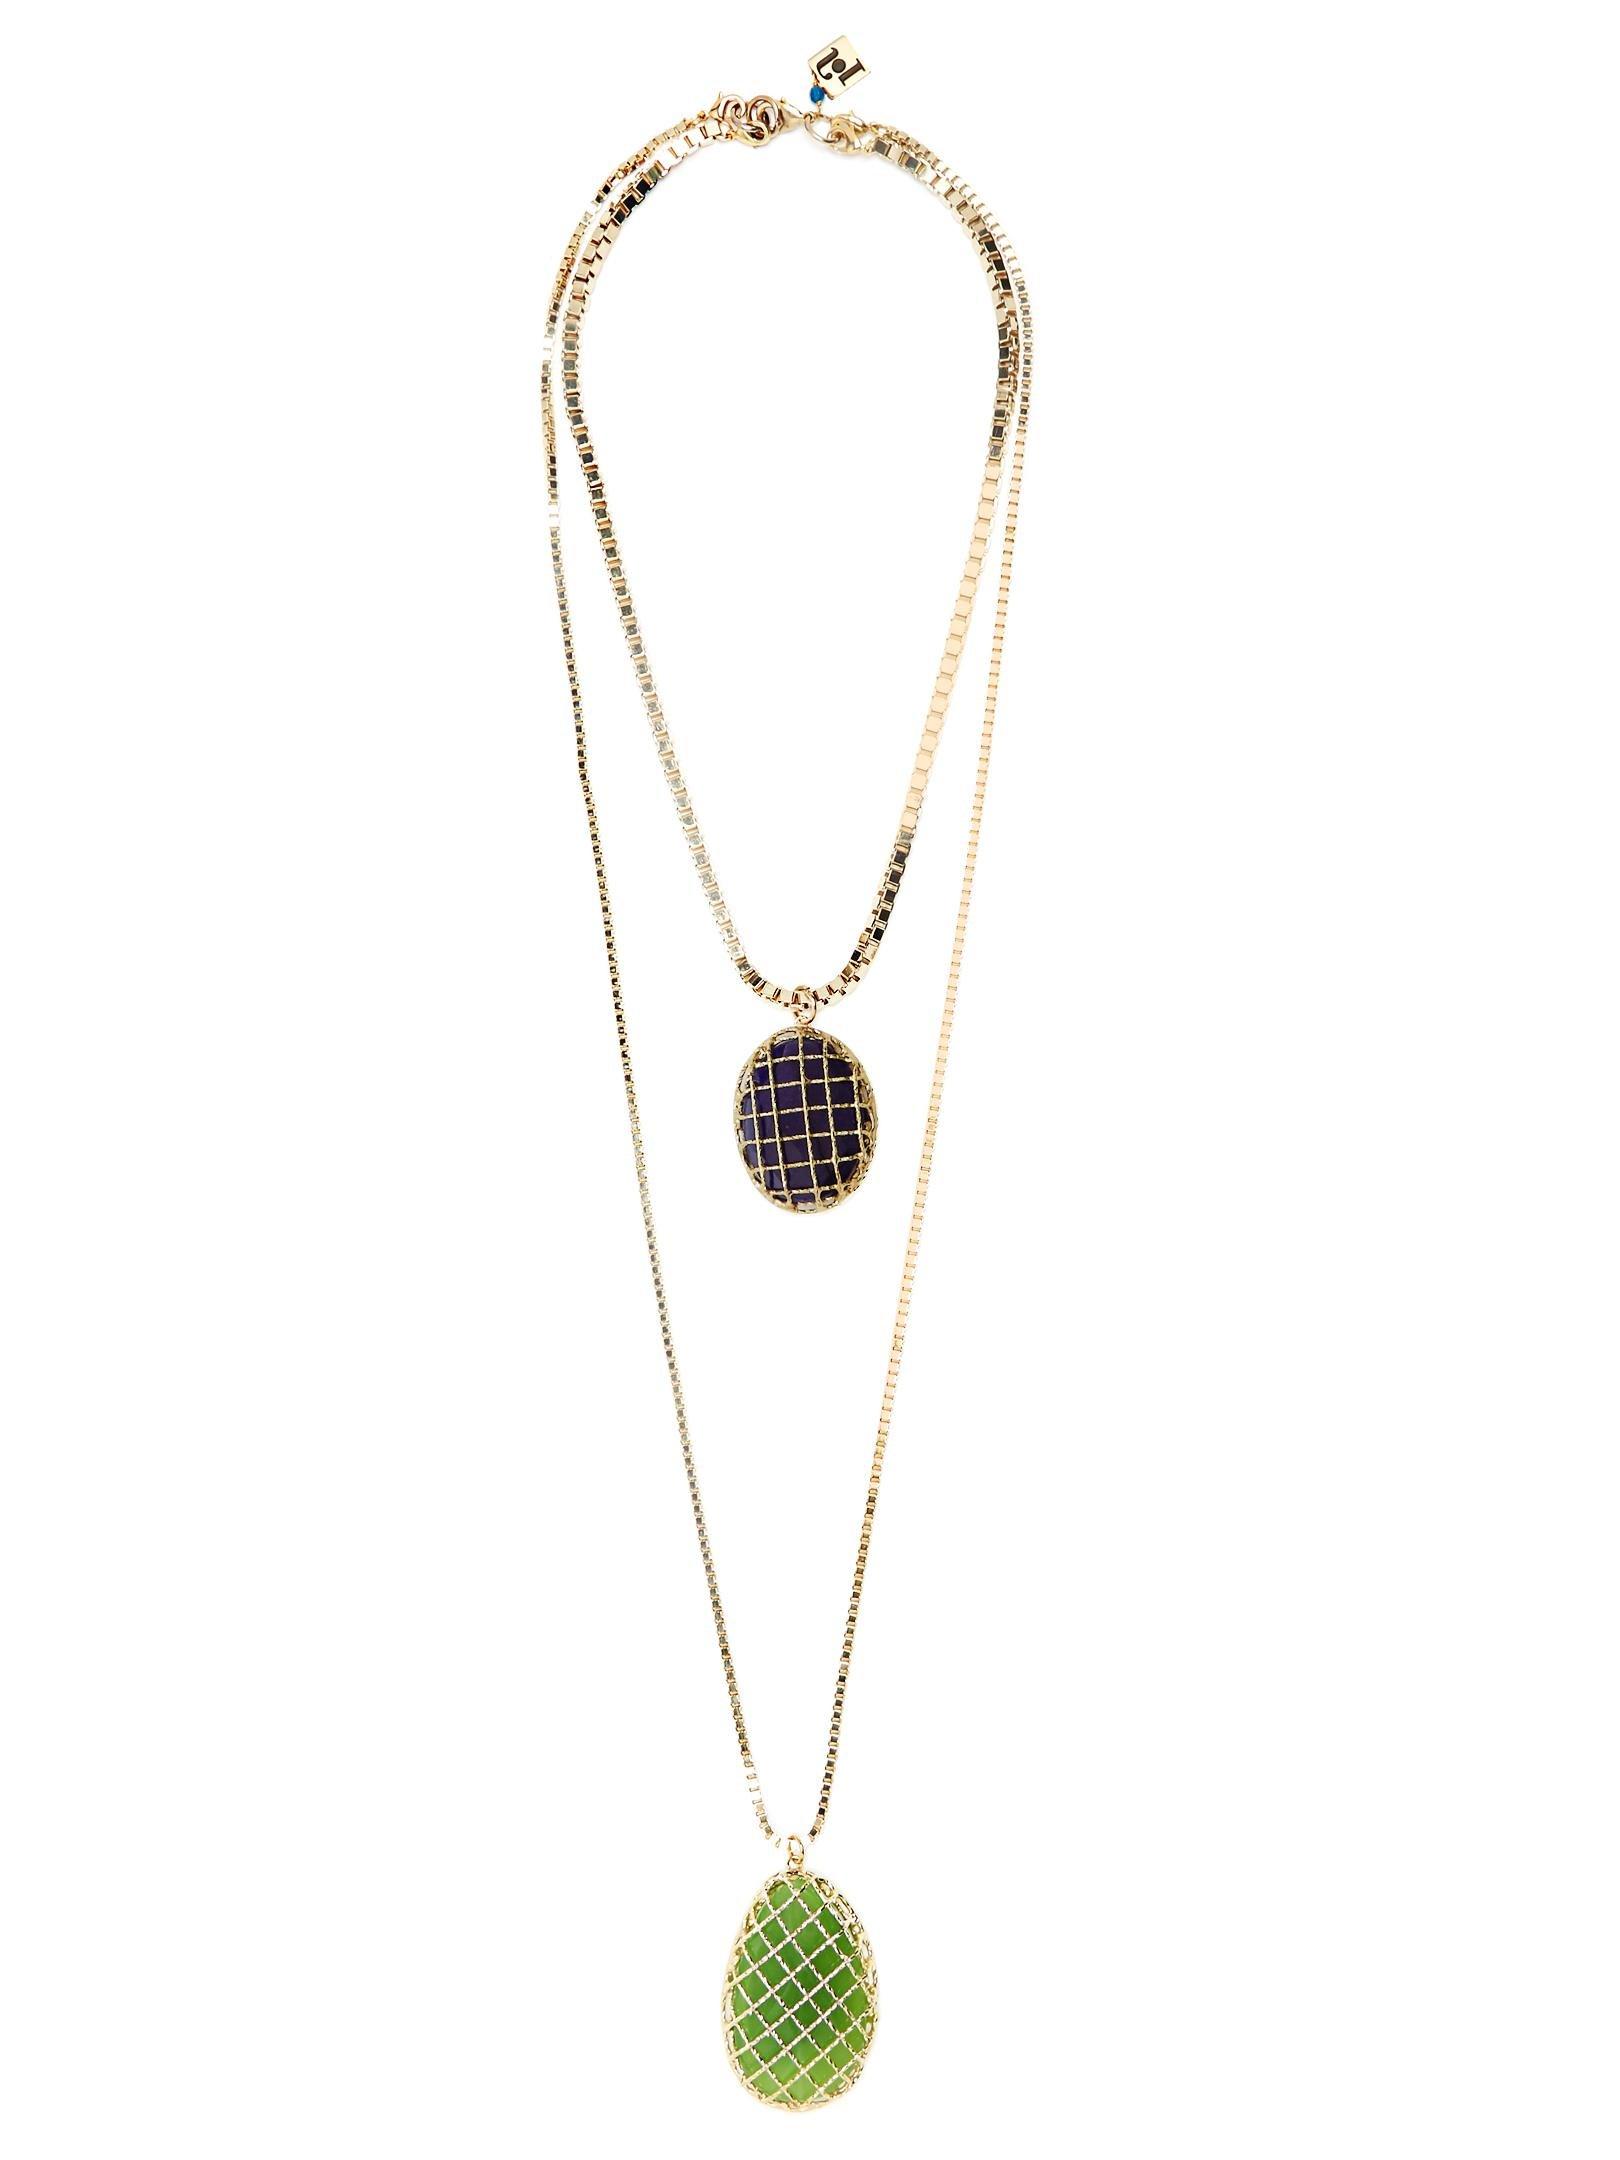 stone double necklace - Blue Rosantica TjN1nRKgA7